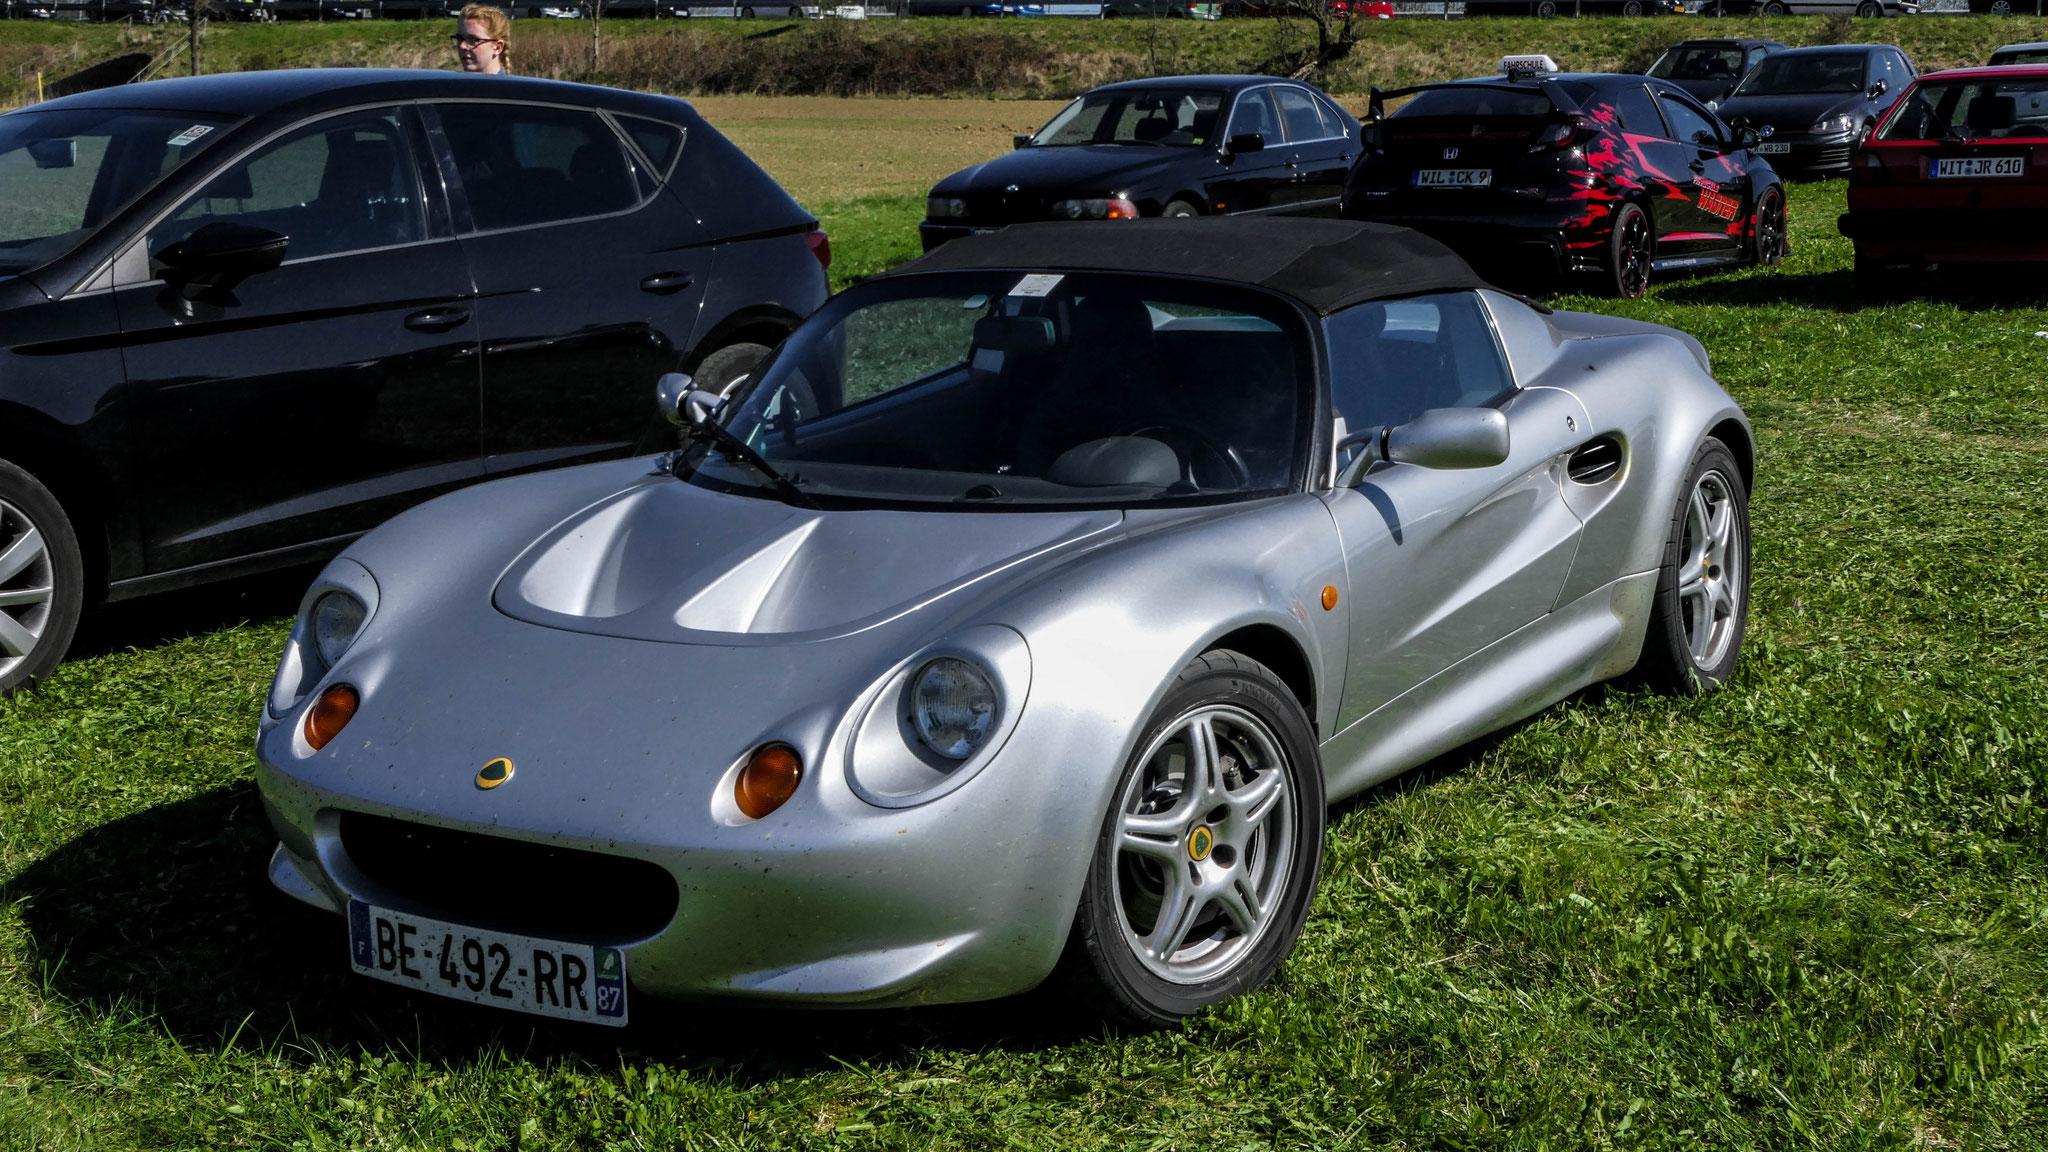 Lotus Elise S1 - BE-492-RR-87 (FRA)